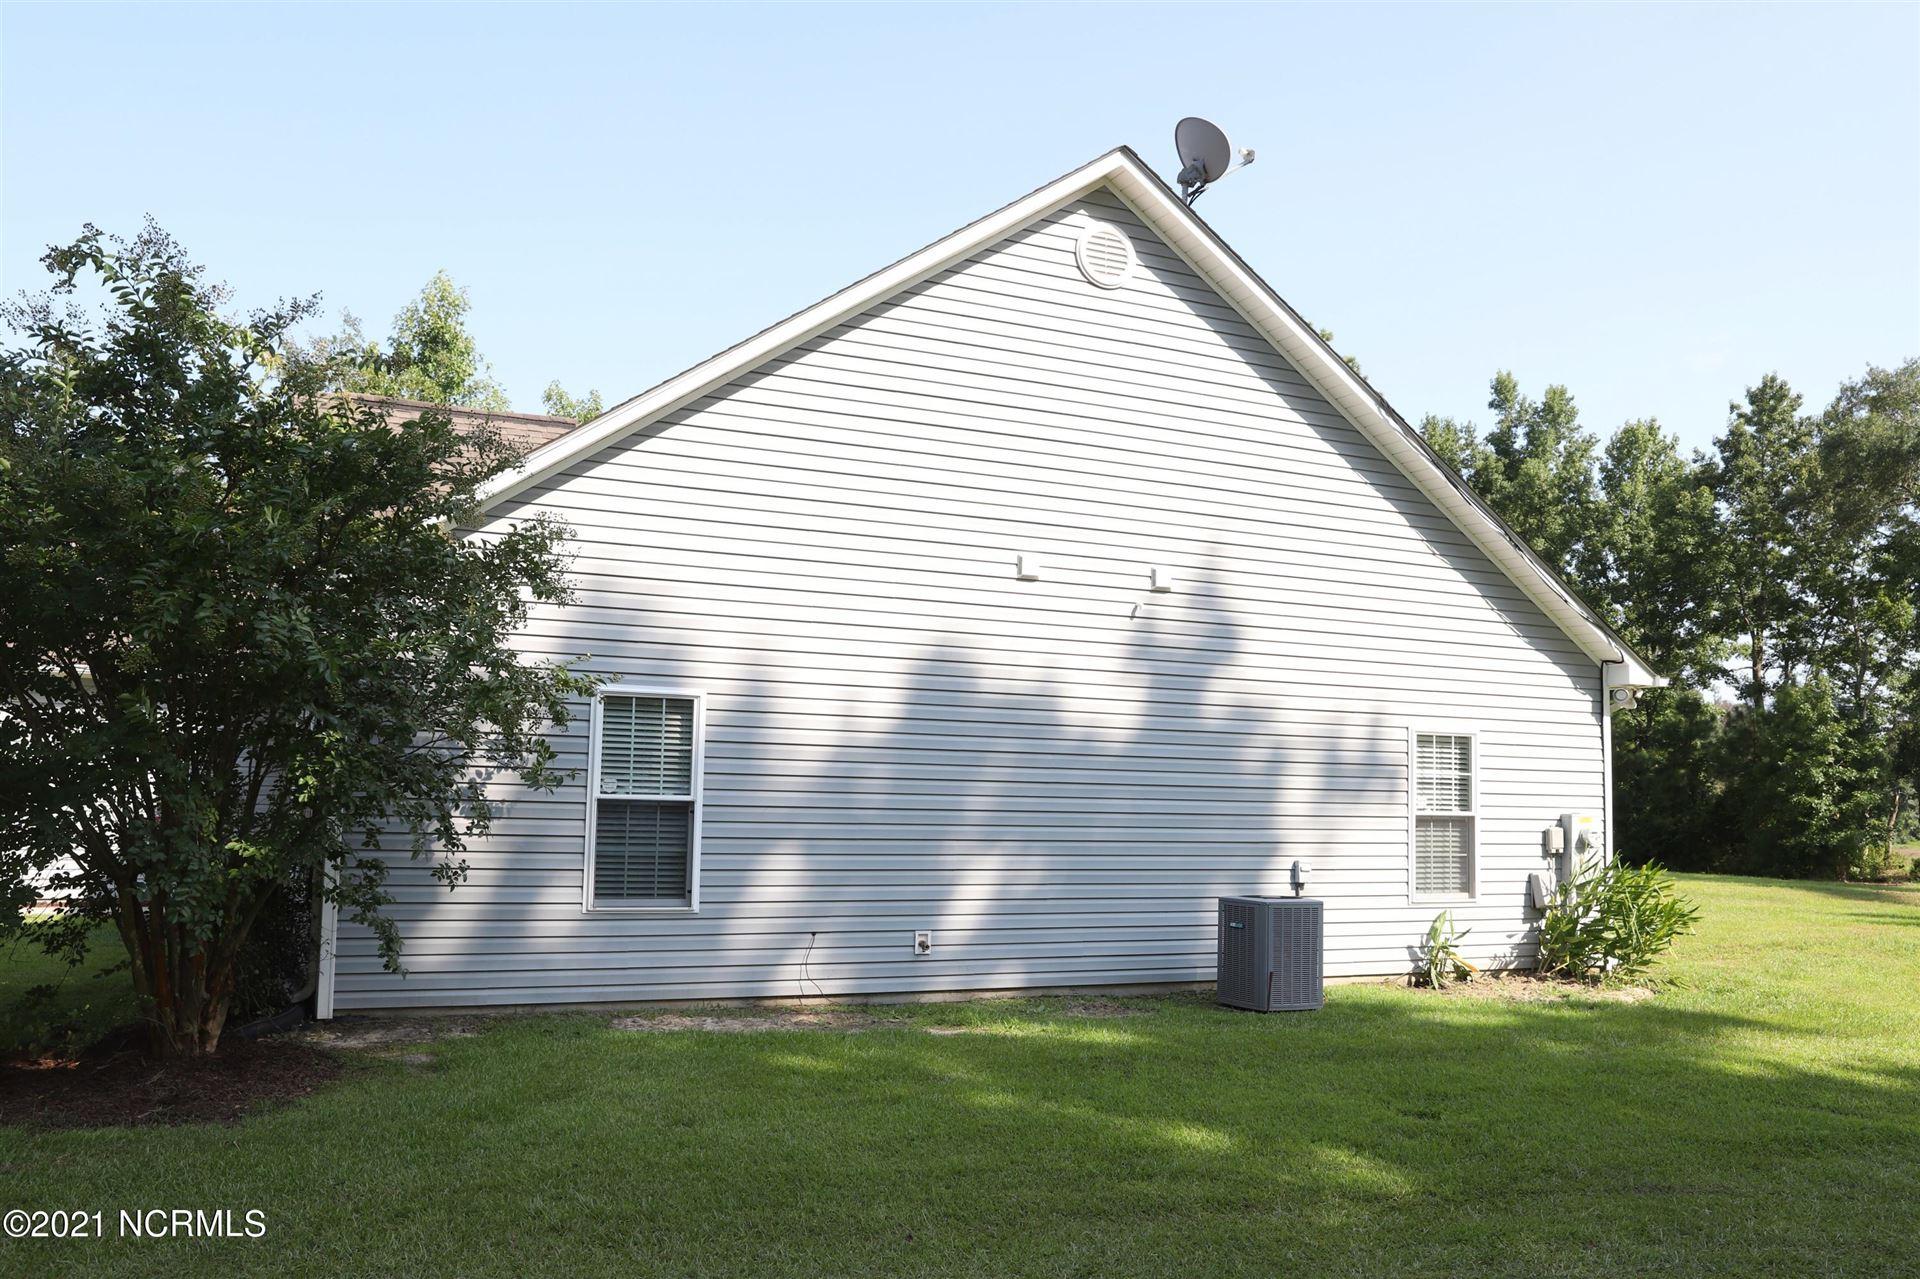 Photo of 1385 Blue Creek Road, Jacksonville, NC 28540 (MLS # 100285212)